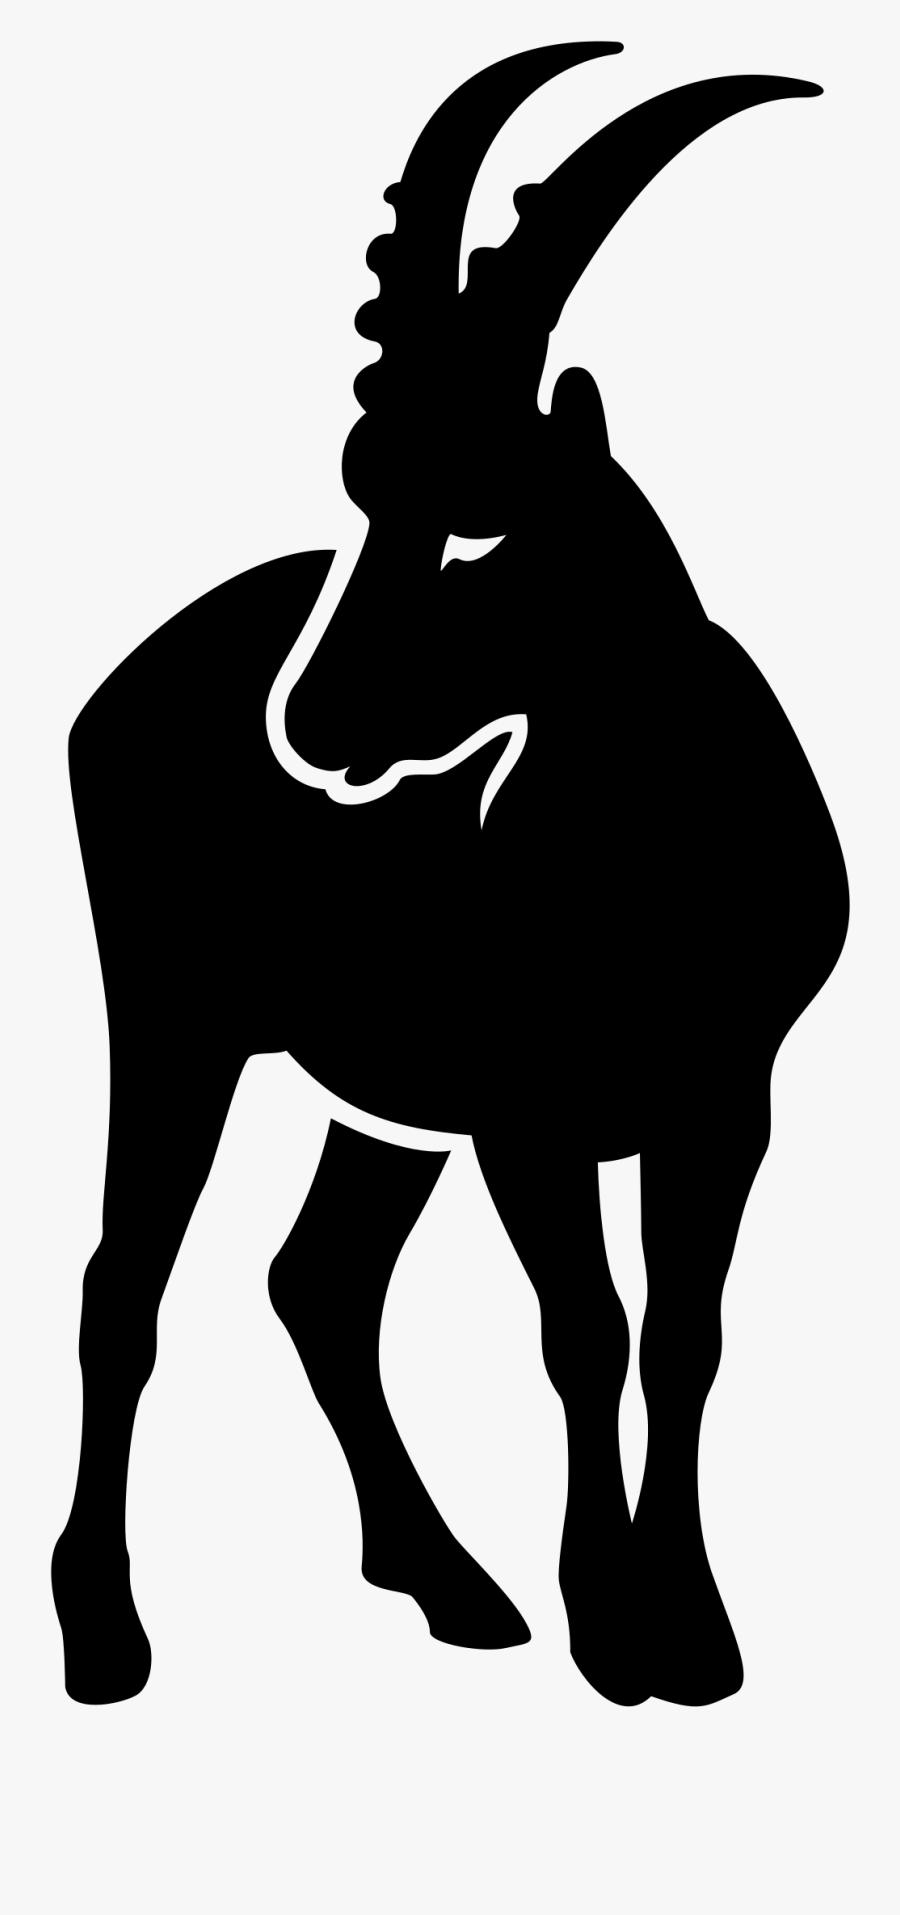 Mountain Goat Clipart Wild Goat - Capricorn Monthly Horoscope 2018, Transparent Clipart